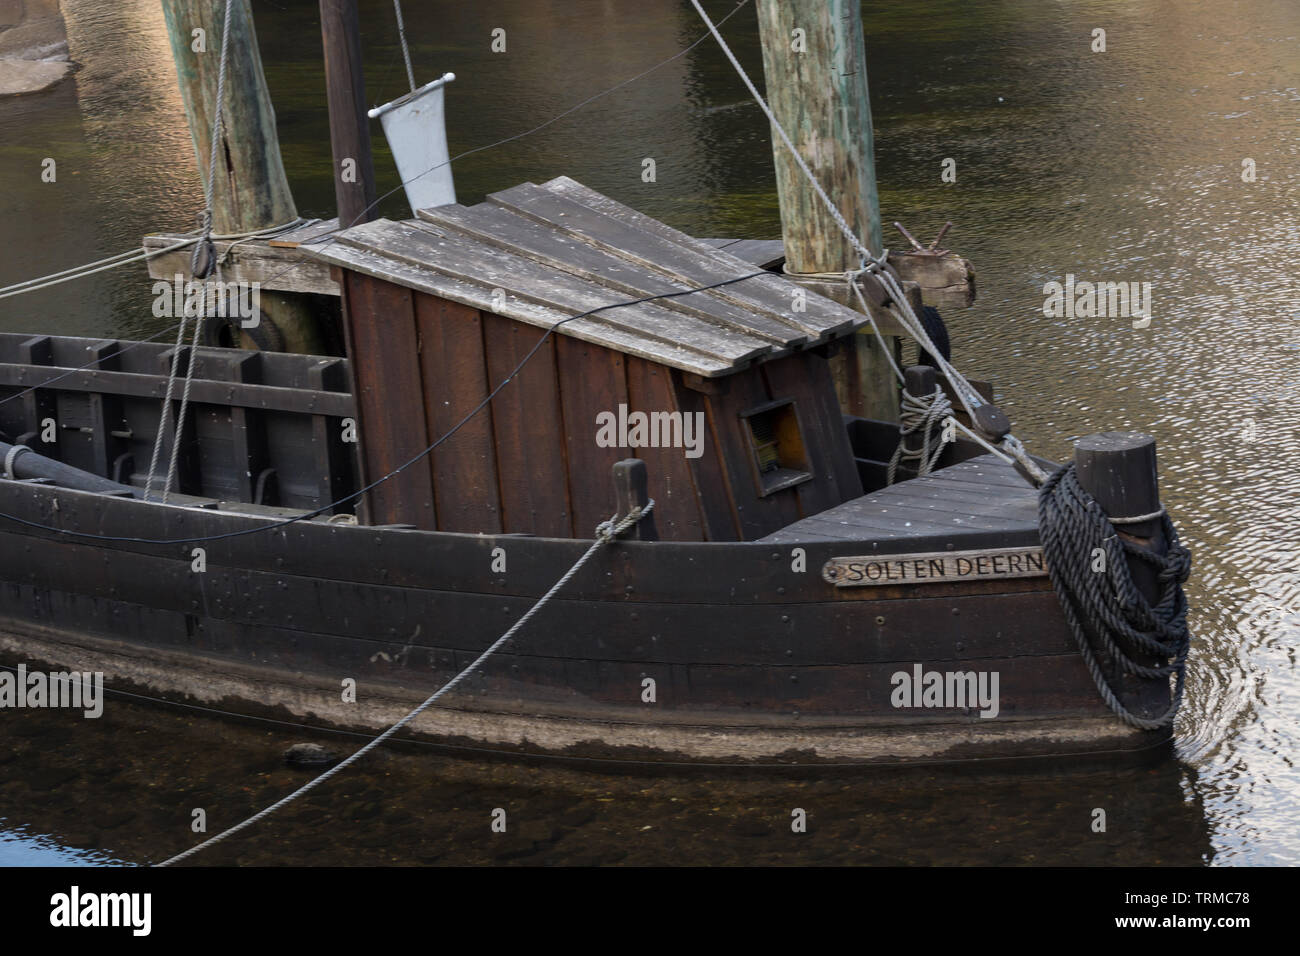 Historic harbor region Lüneburg with the ships salt Ewer and the salt Prahm, Lower Saxony Germany Stock Photo